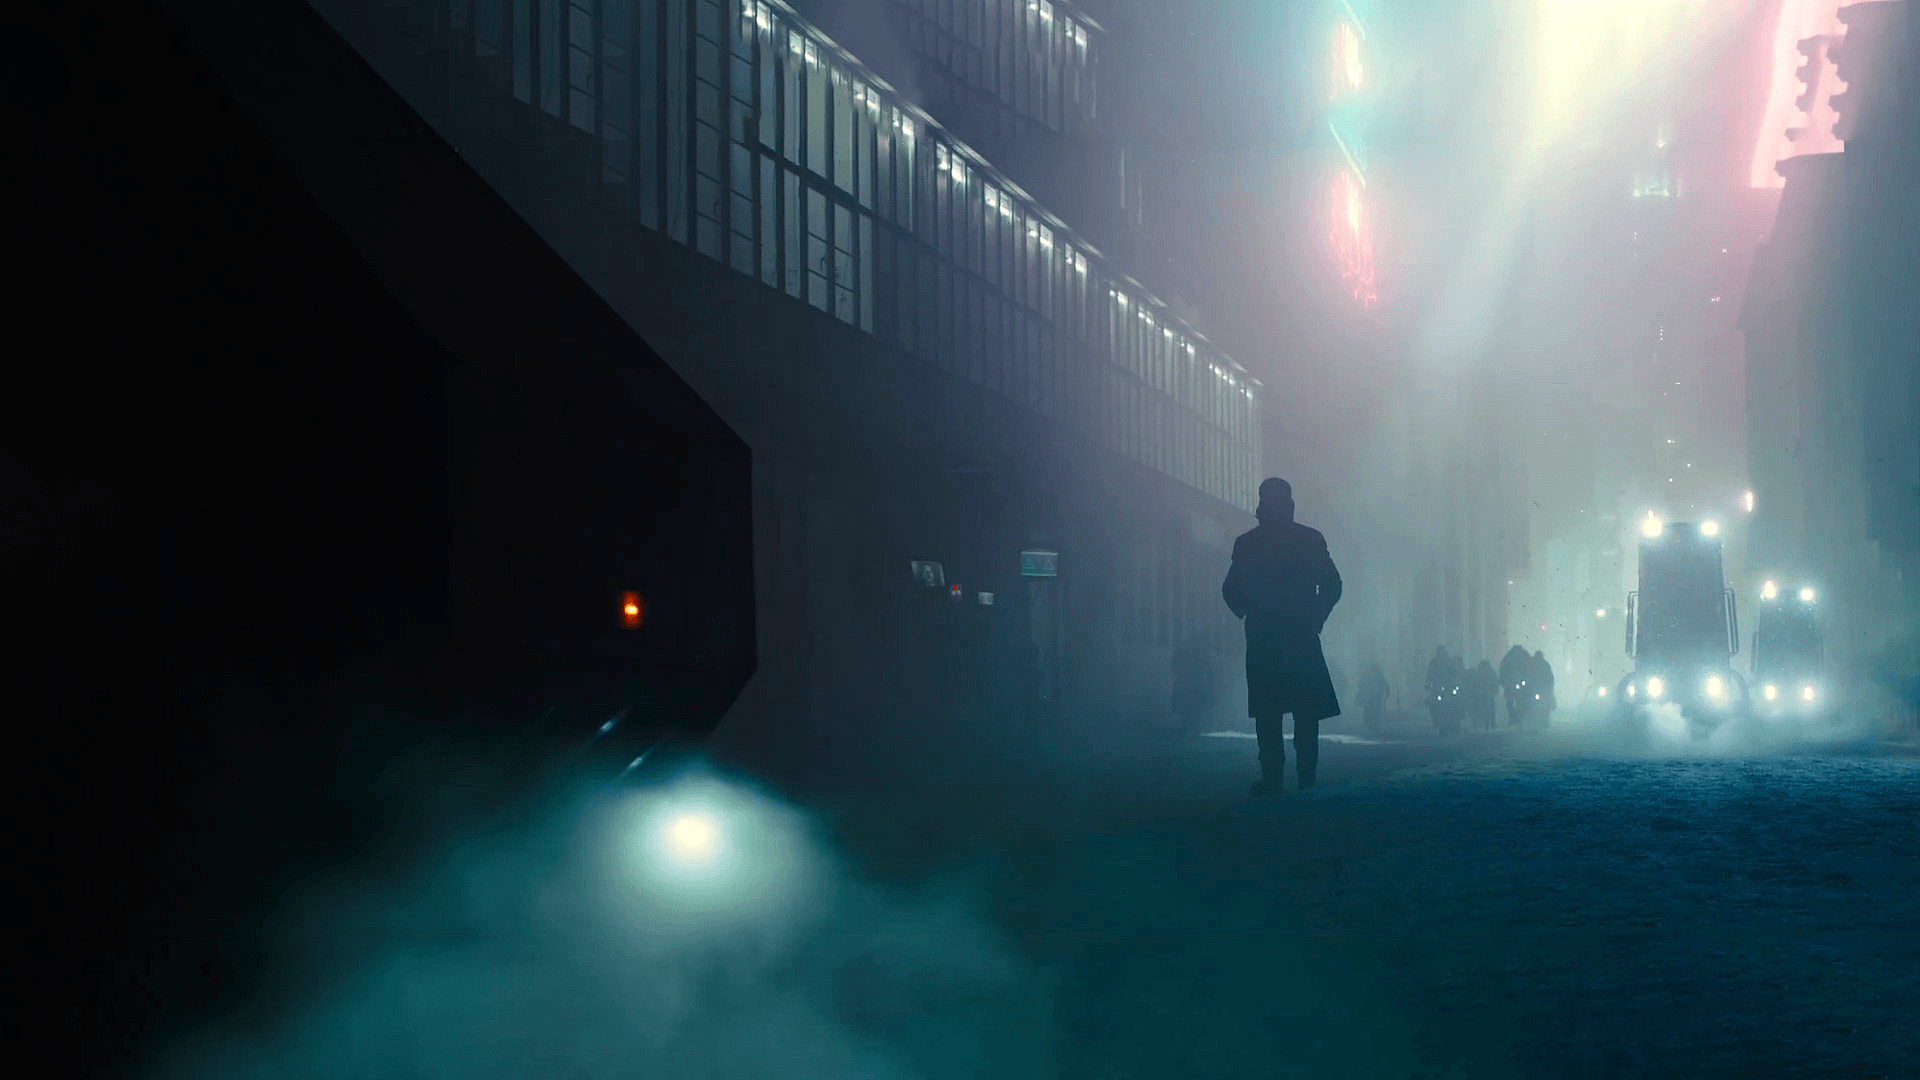 Blade Runner 2049 4K Wallpapers - Top Free Blade Runner ...